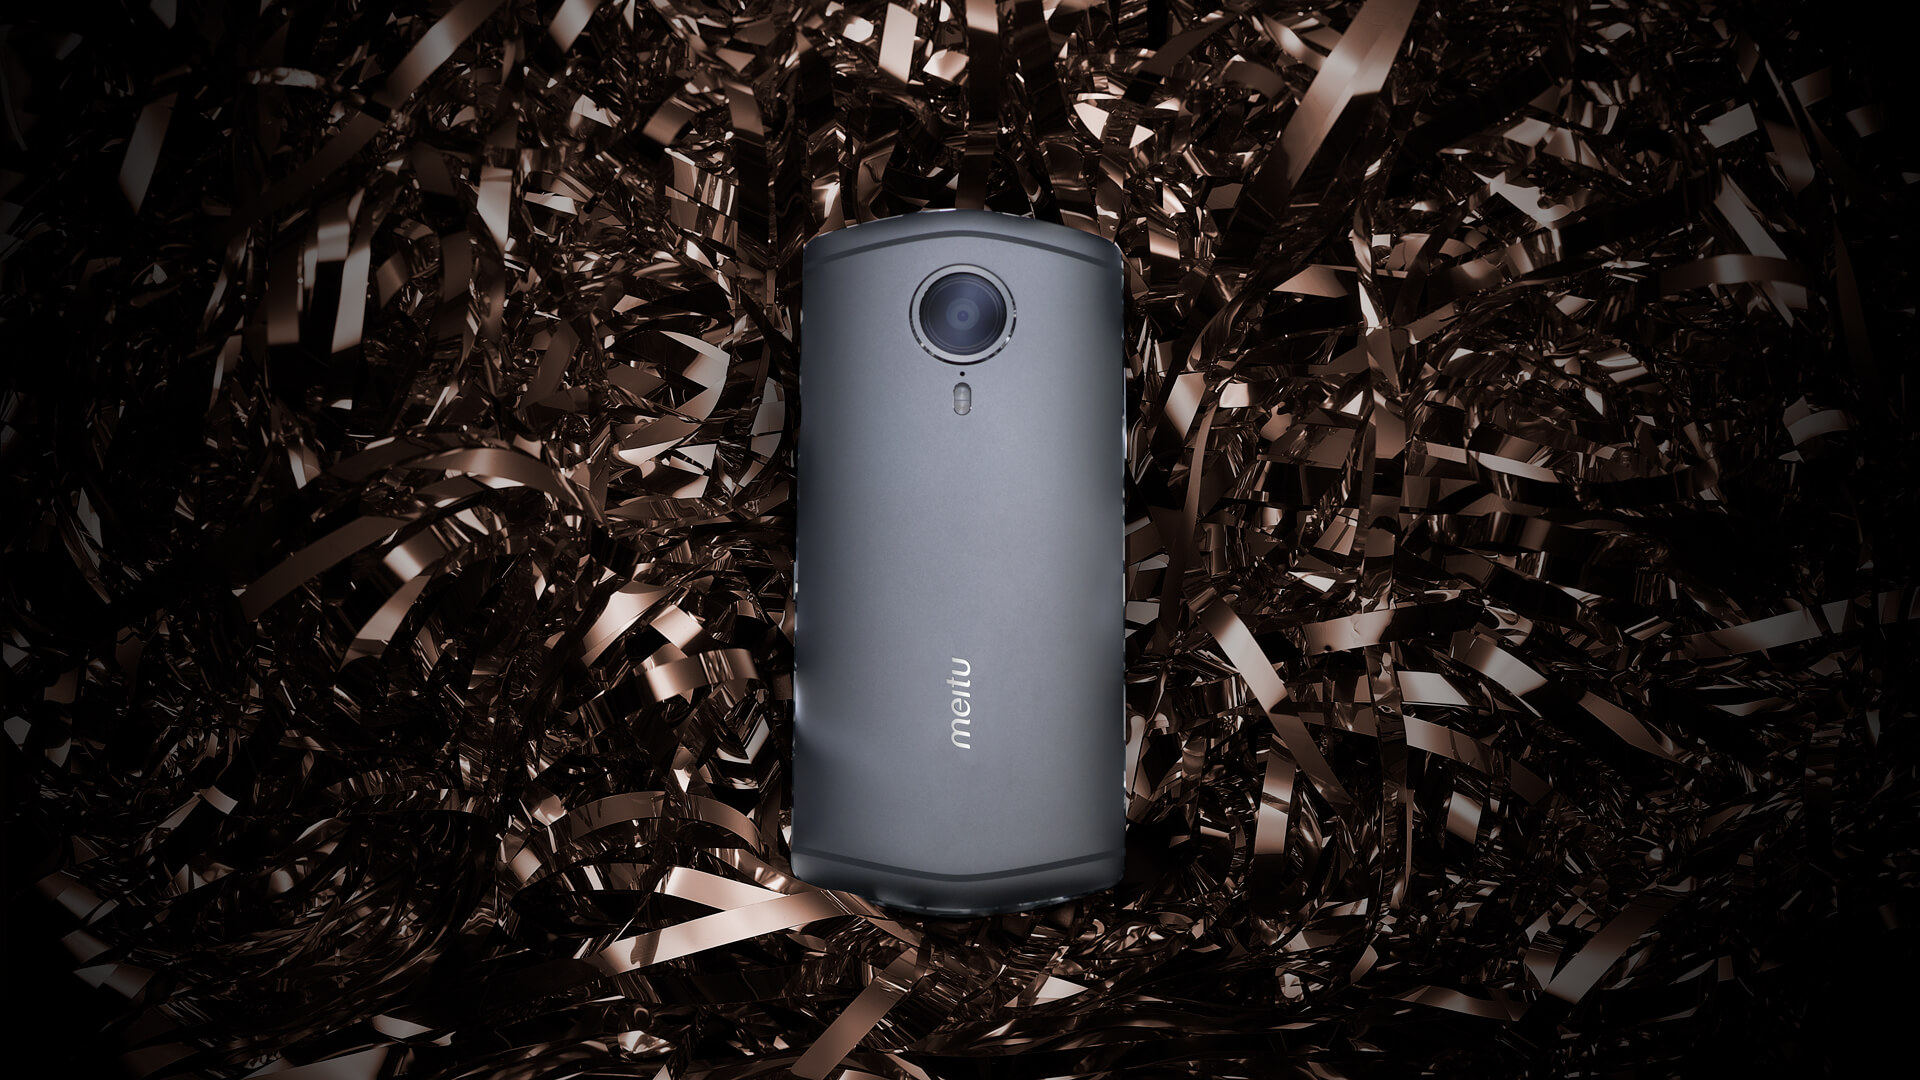 The diamond grey version of the Meitu T8 smartphone.